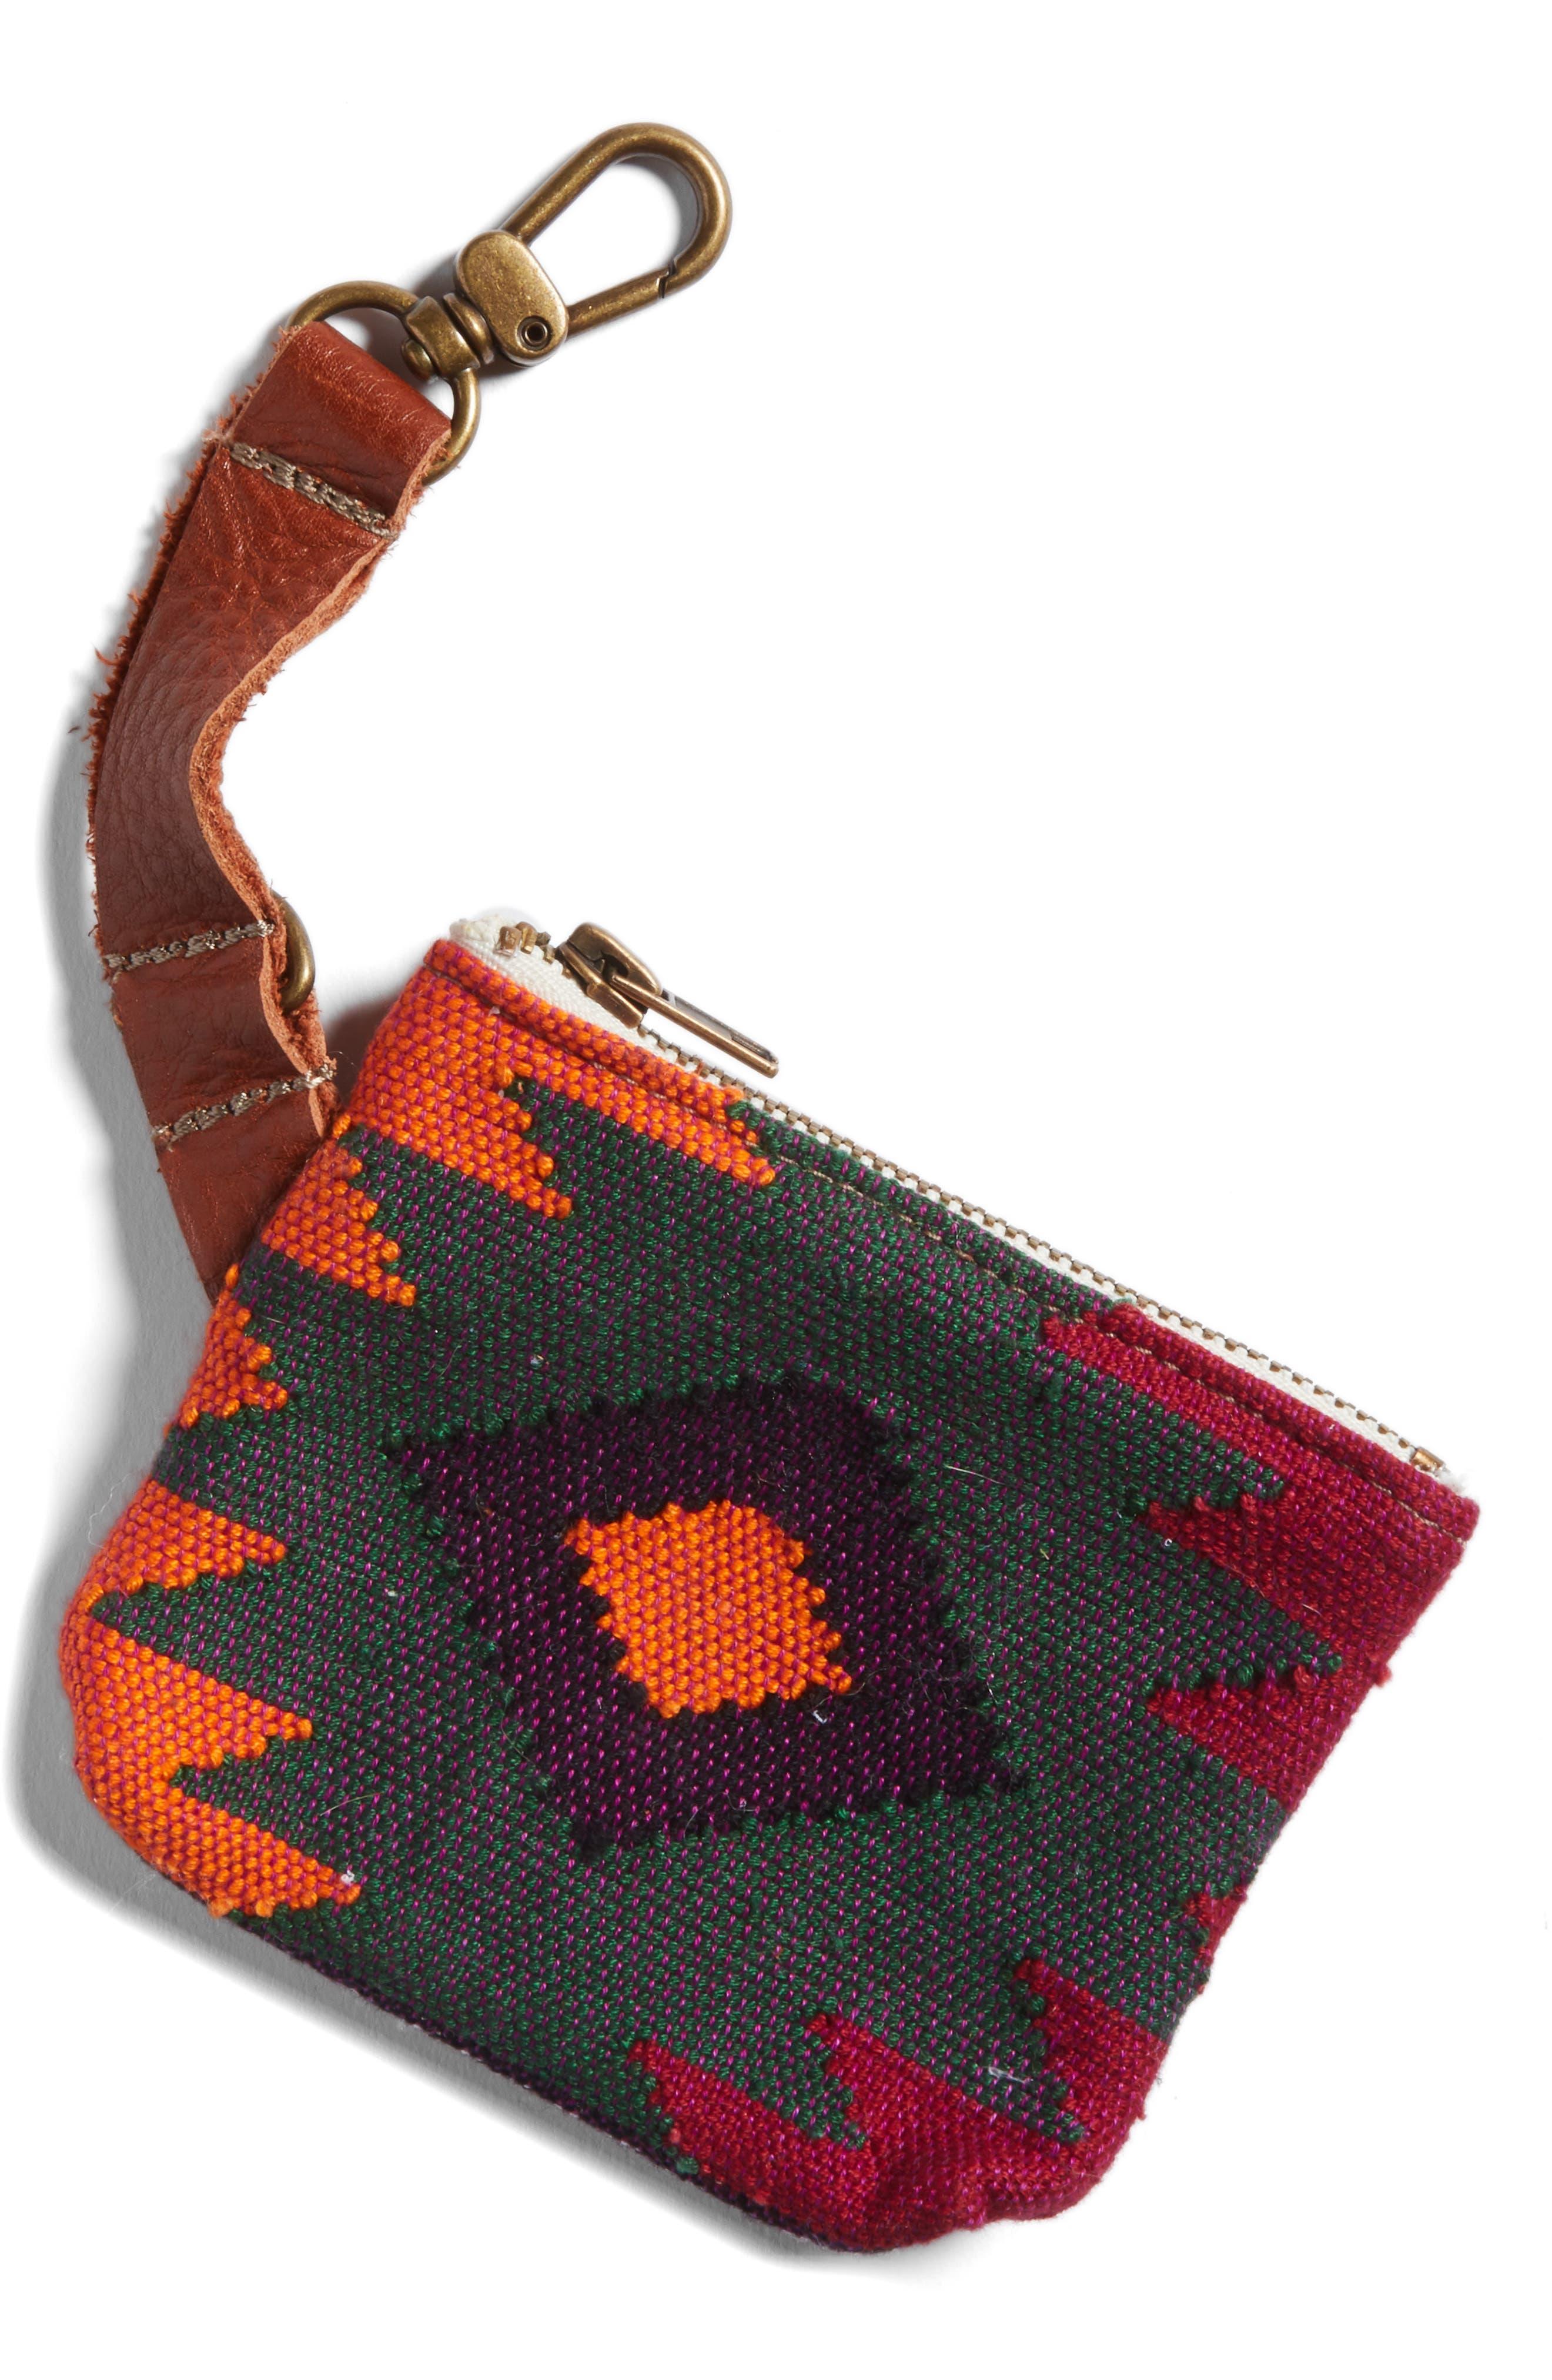 Alternate Image 1 Selected - Salvage Maria Oaxaca Sunburst Waste Bag Pouch